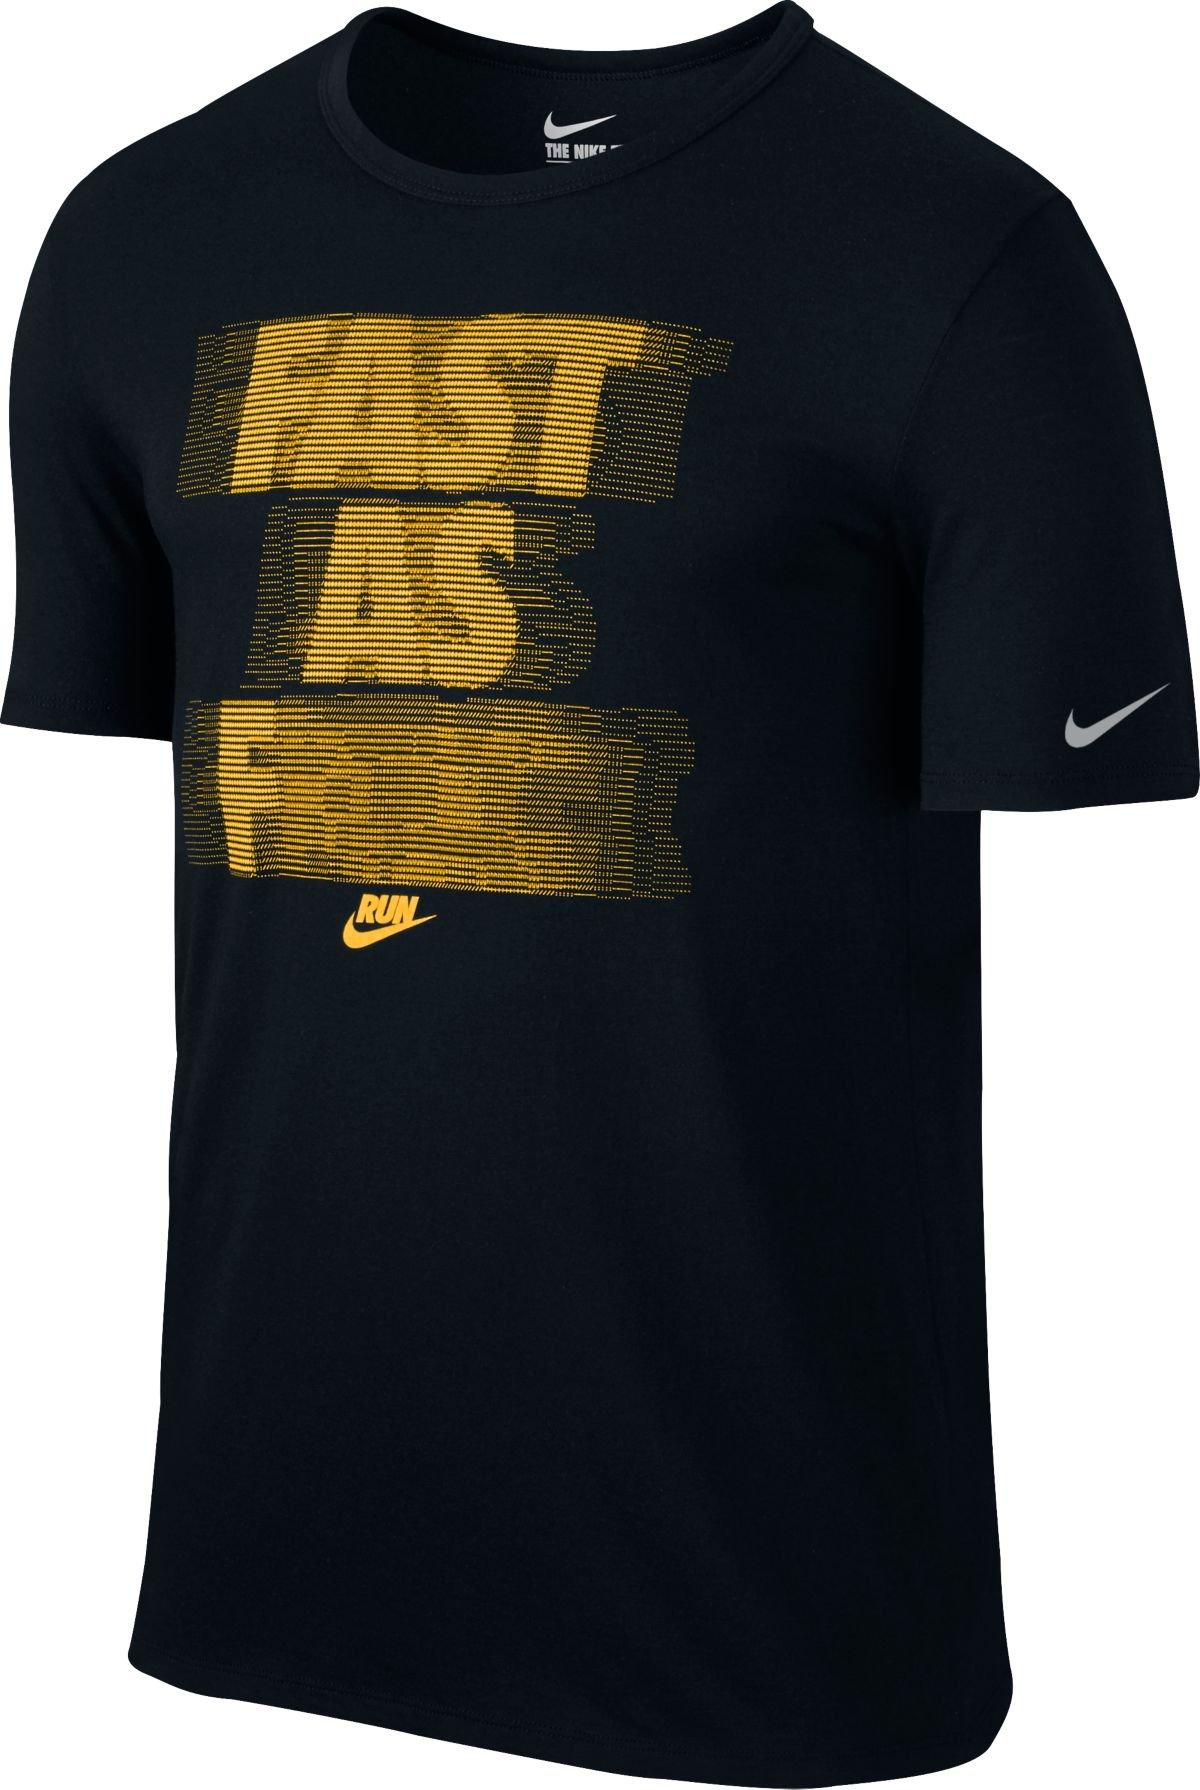 Triko Nike RUN P FAST AS TEE